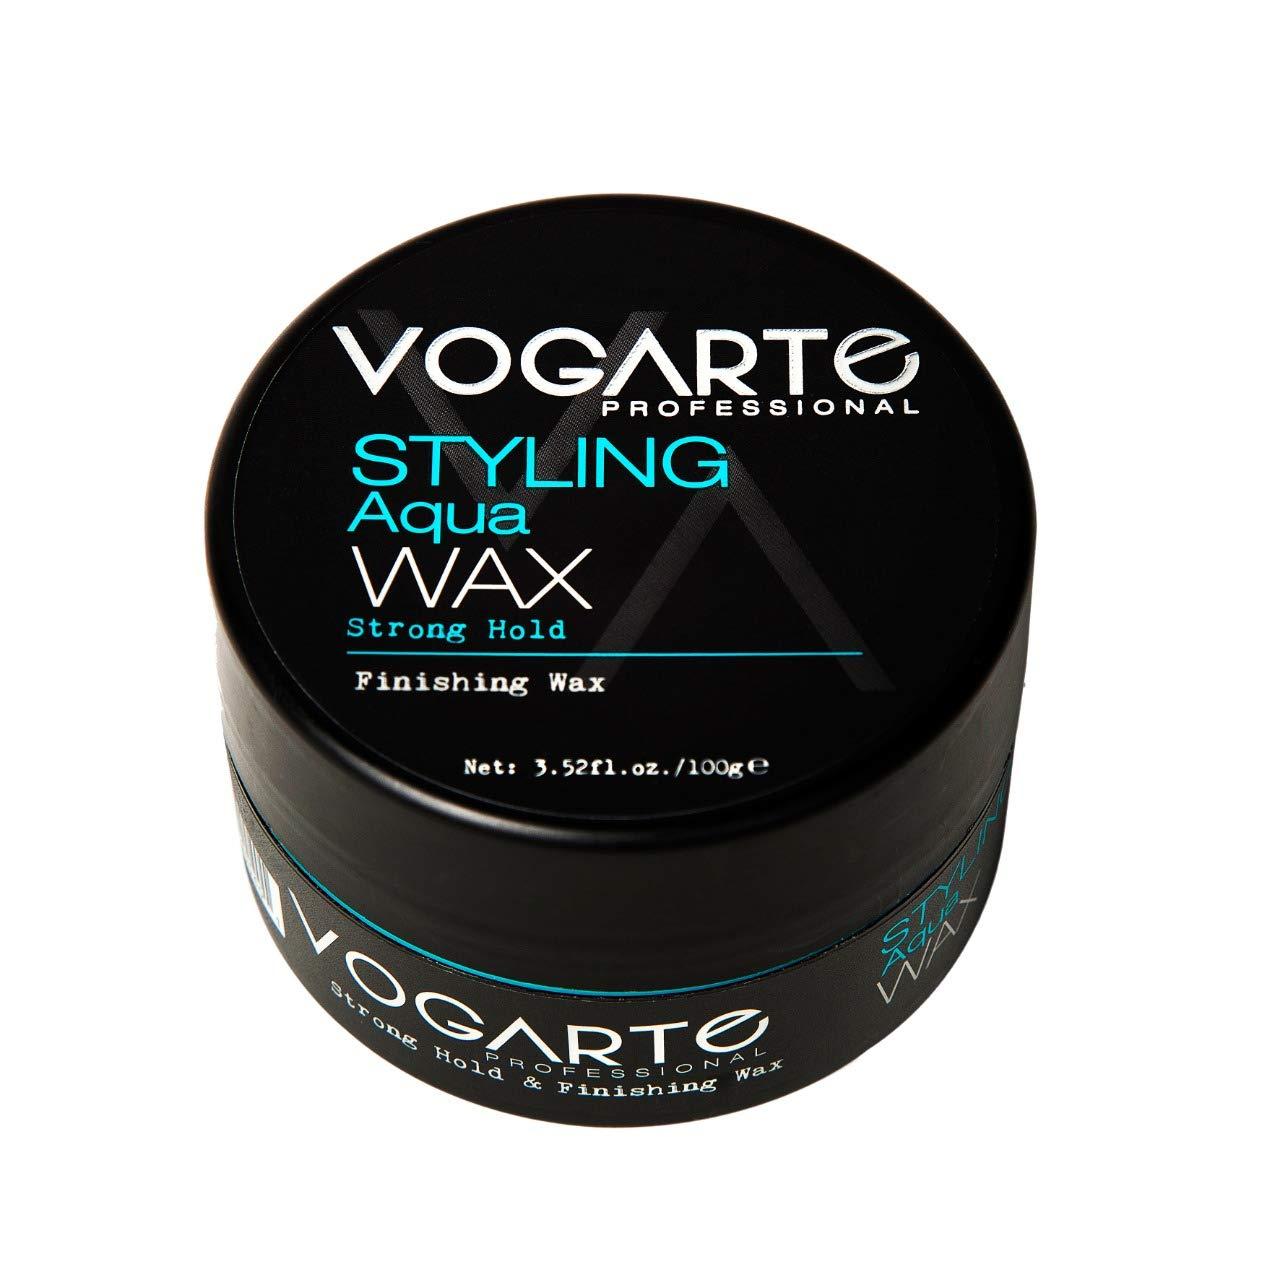 VOGARTE Hair Styling Aqua Wax for Men, Strong Hold & Shiny Finish, 3.52 oz